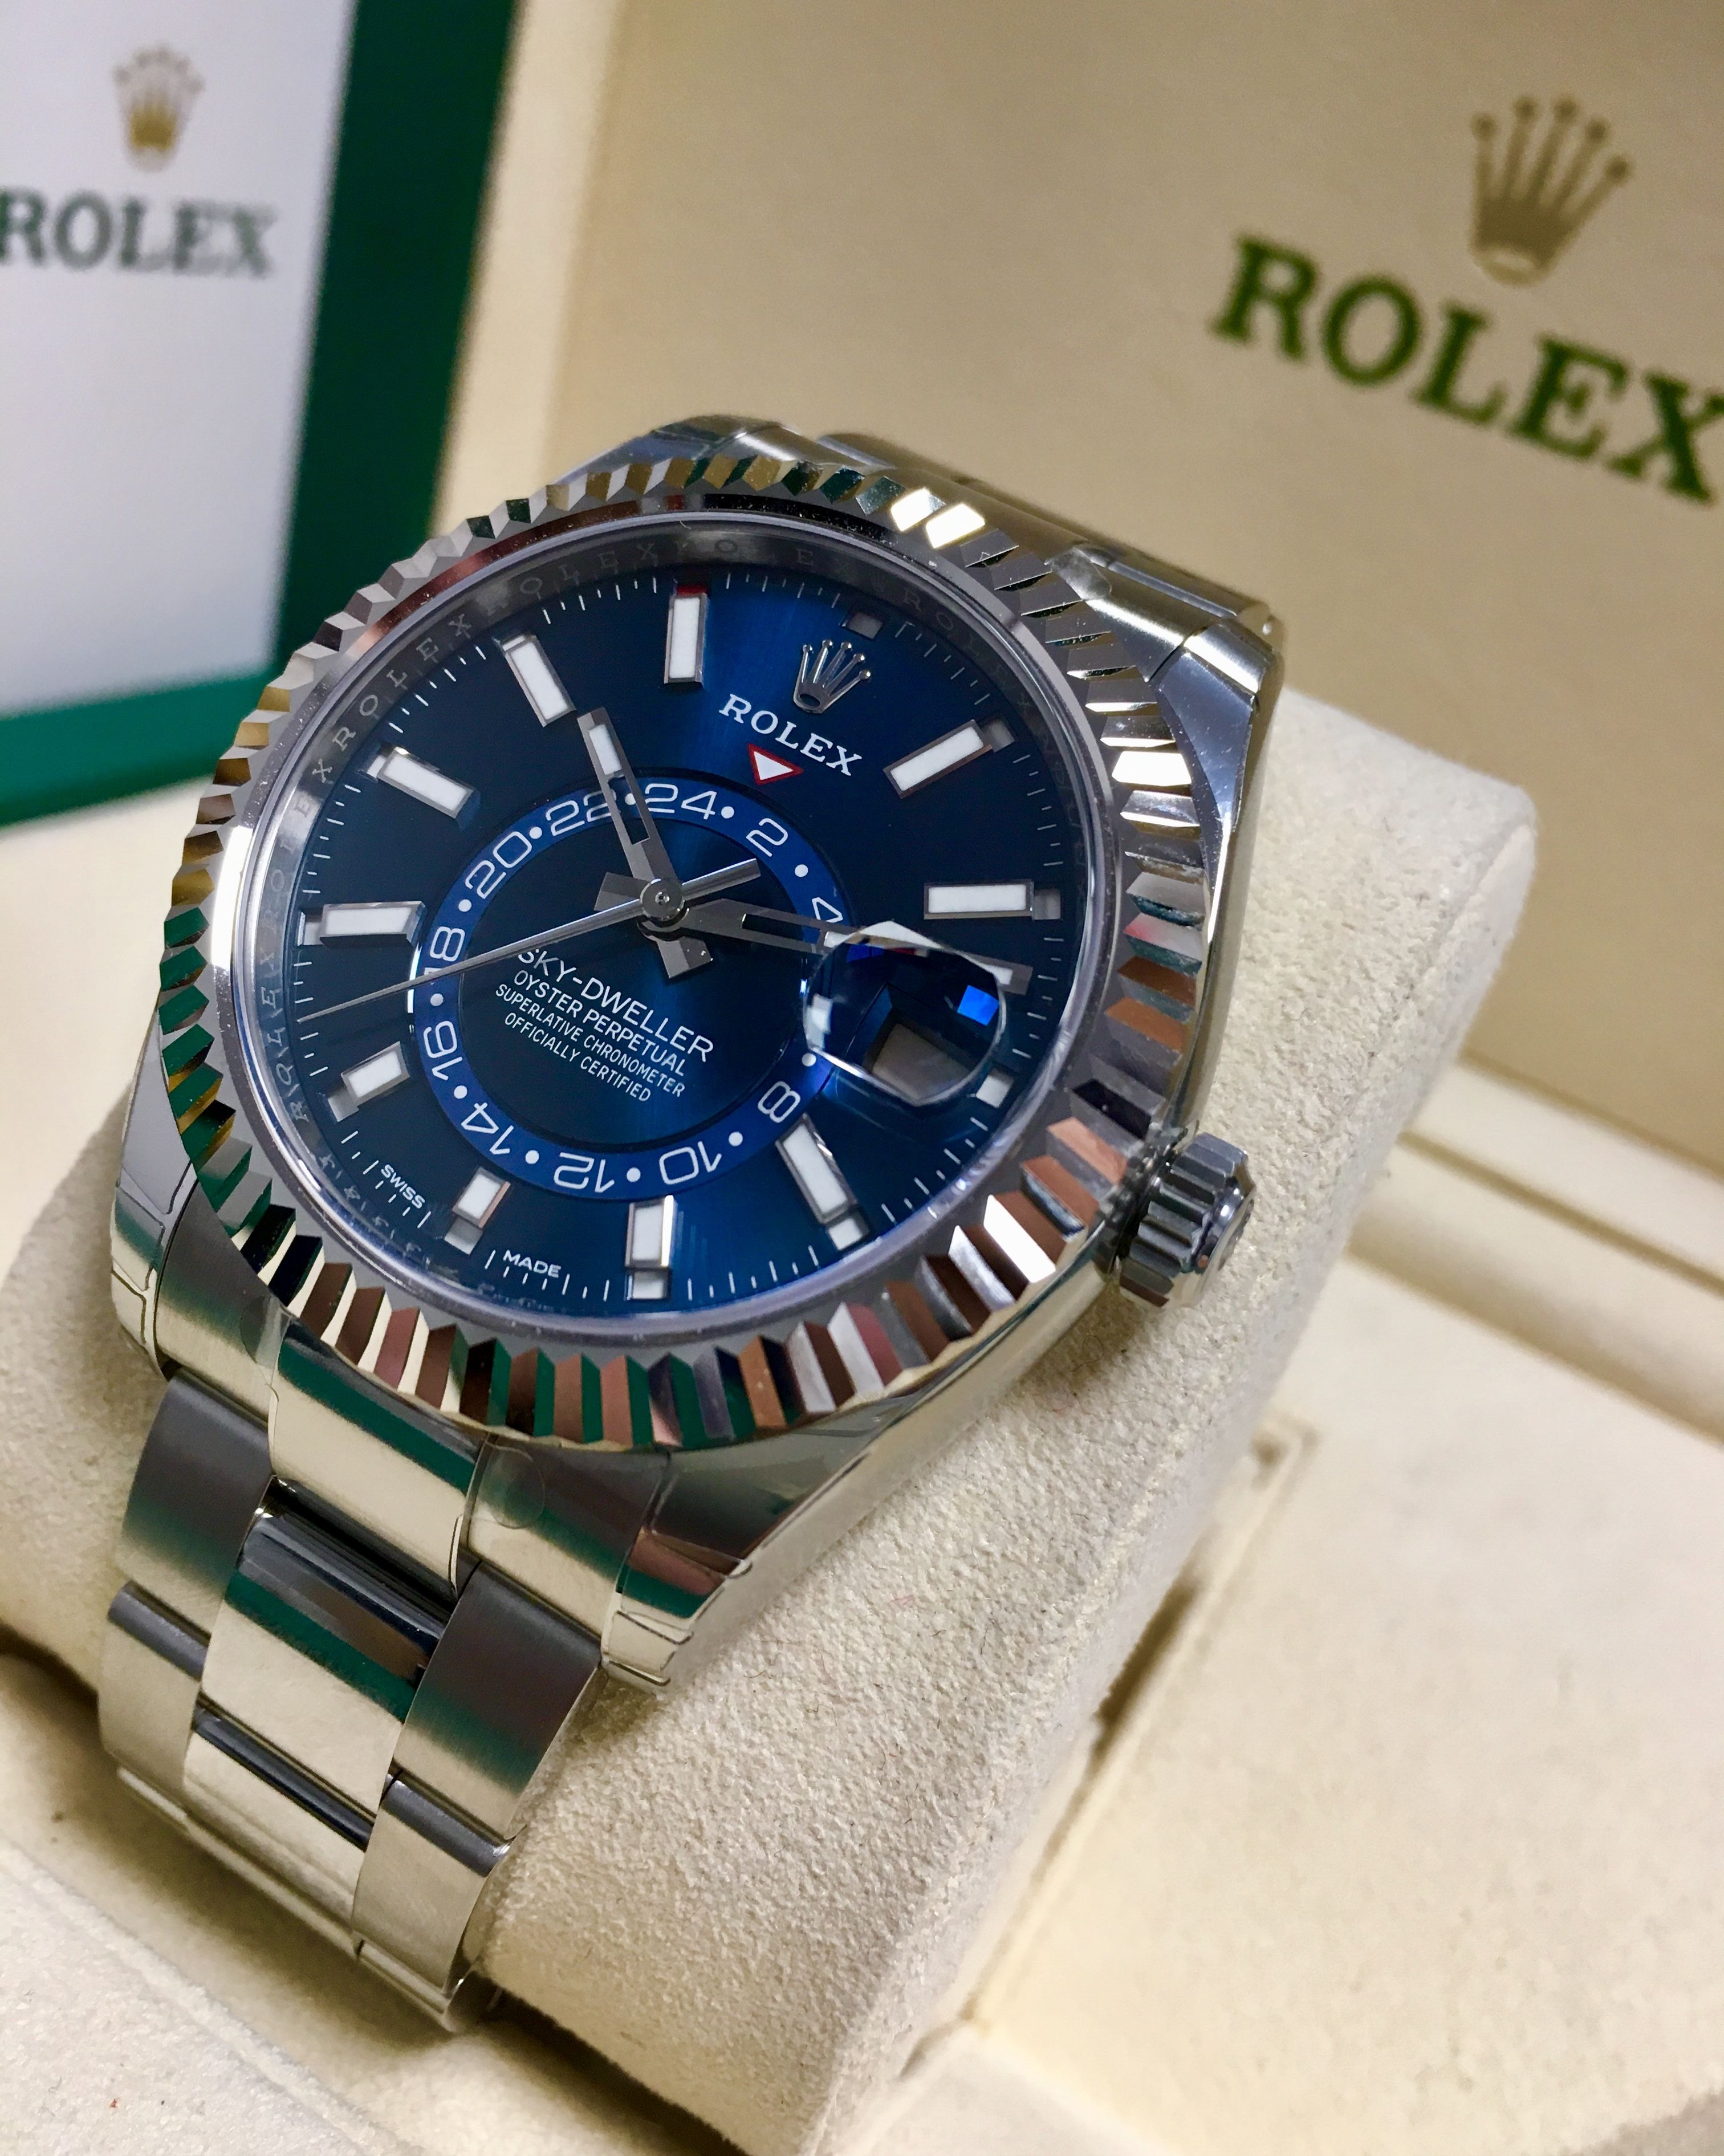 WOTW Jon Rahm\u0027s Rolex Oyster Perpetual Sky,Dweller \u2013 GolfWRX